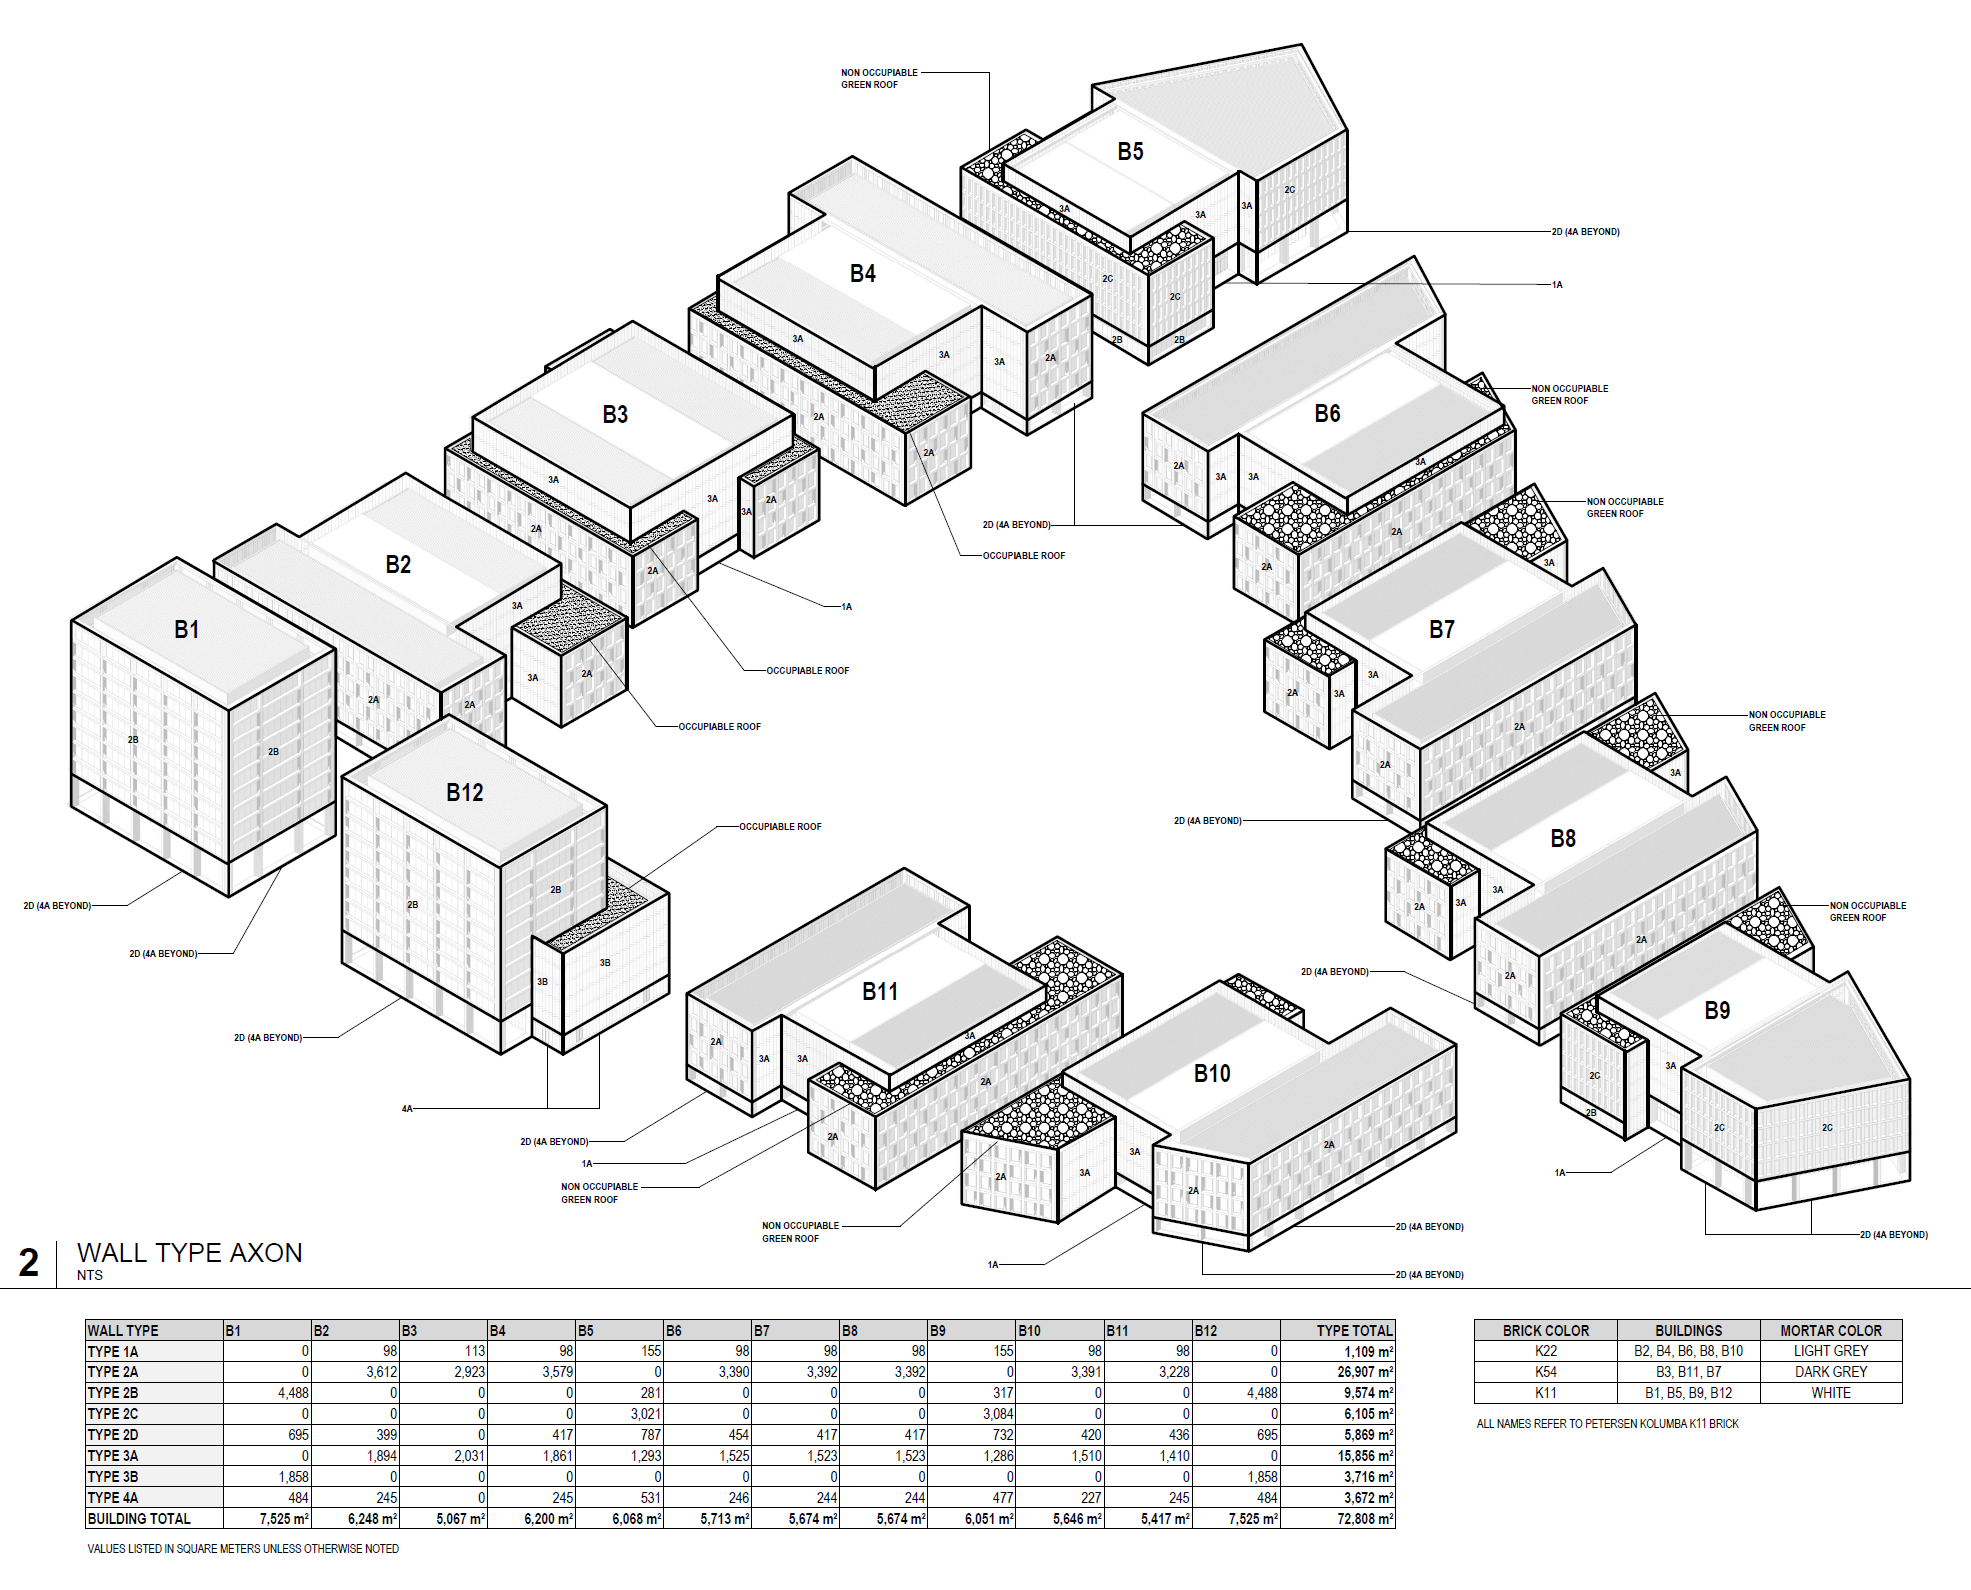 2019-02-09 07_10_37-A-0-501 - EXTERIOR WALL TYPE DIAGRAMS.pdf - Adobe Acrobat Pro DC.png